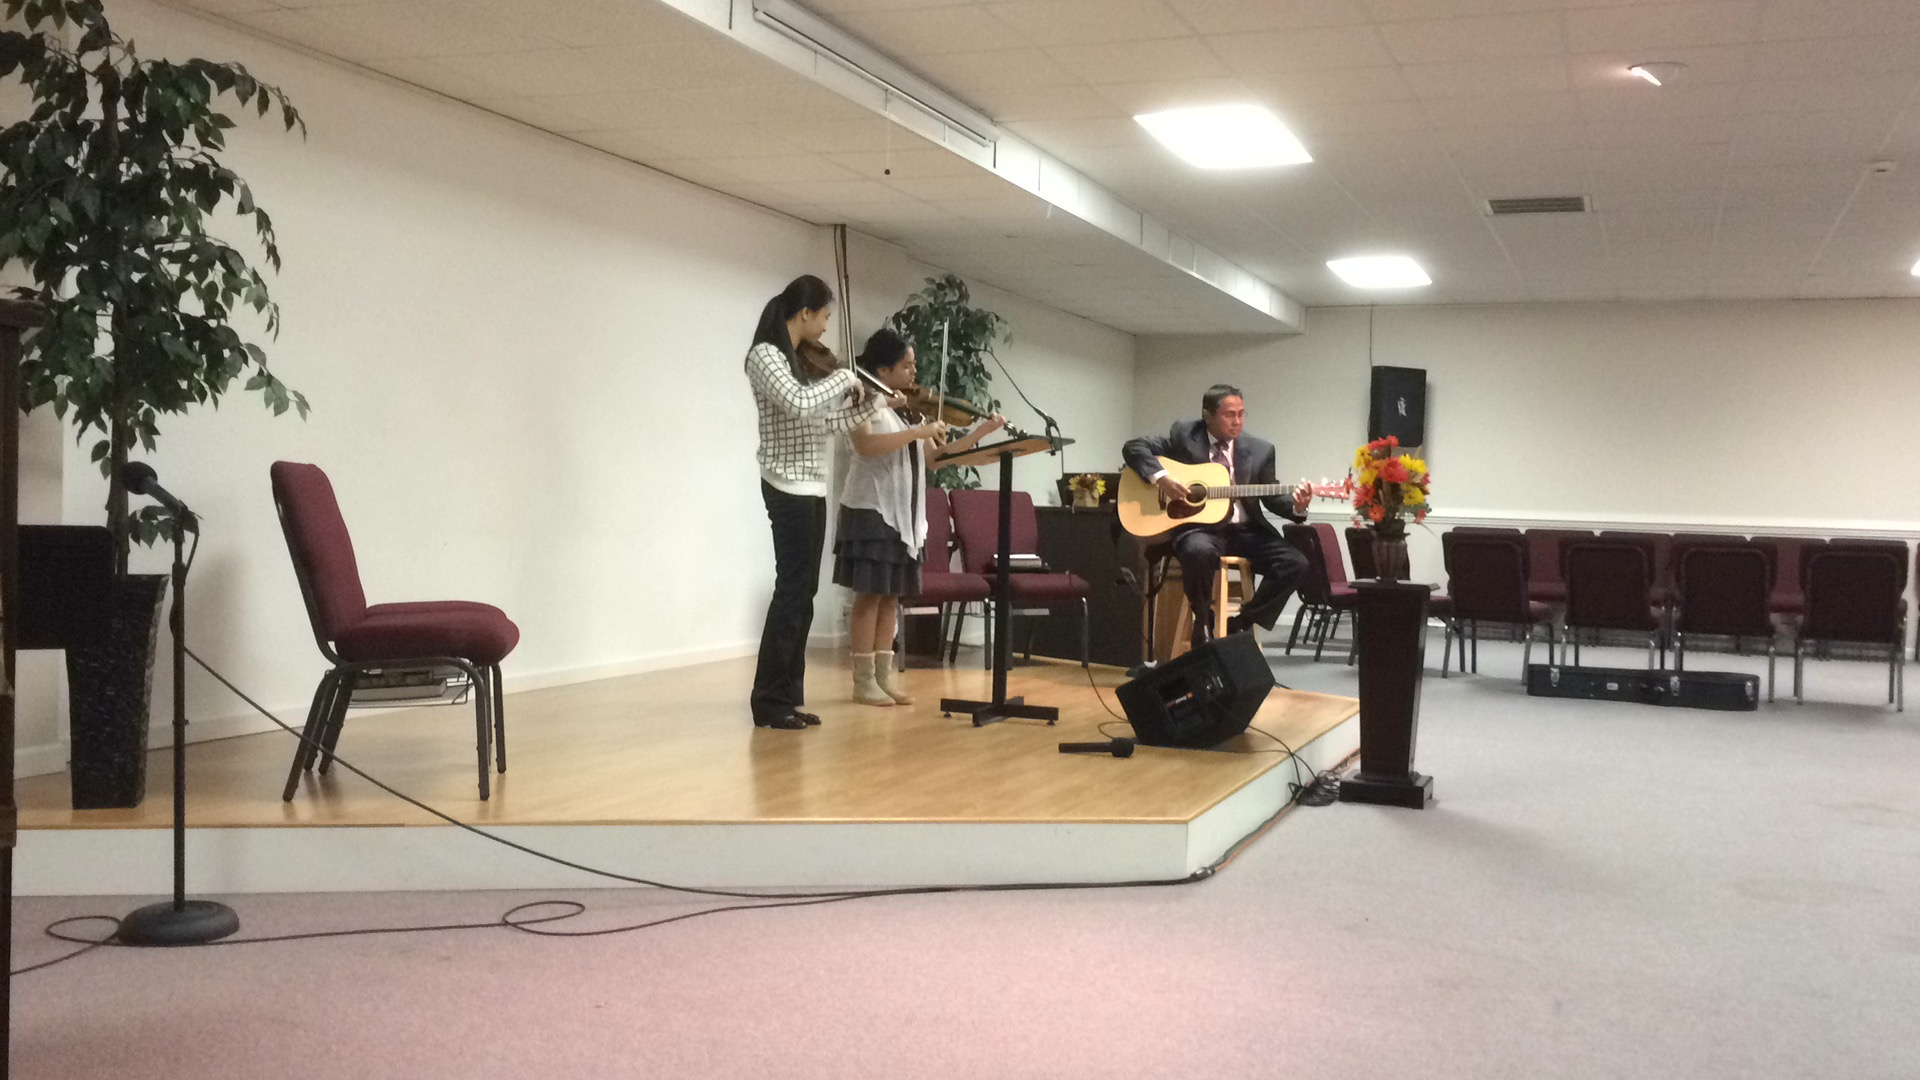 Praising God with music